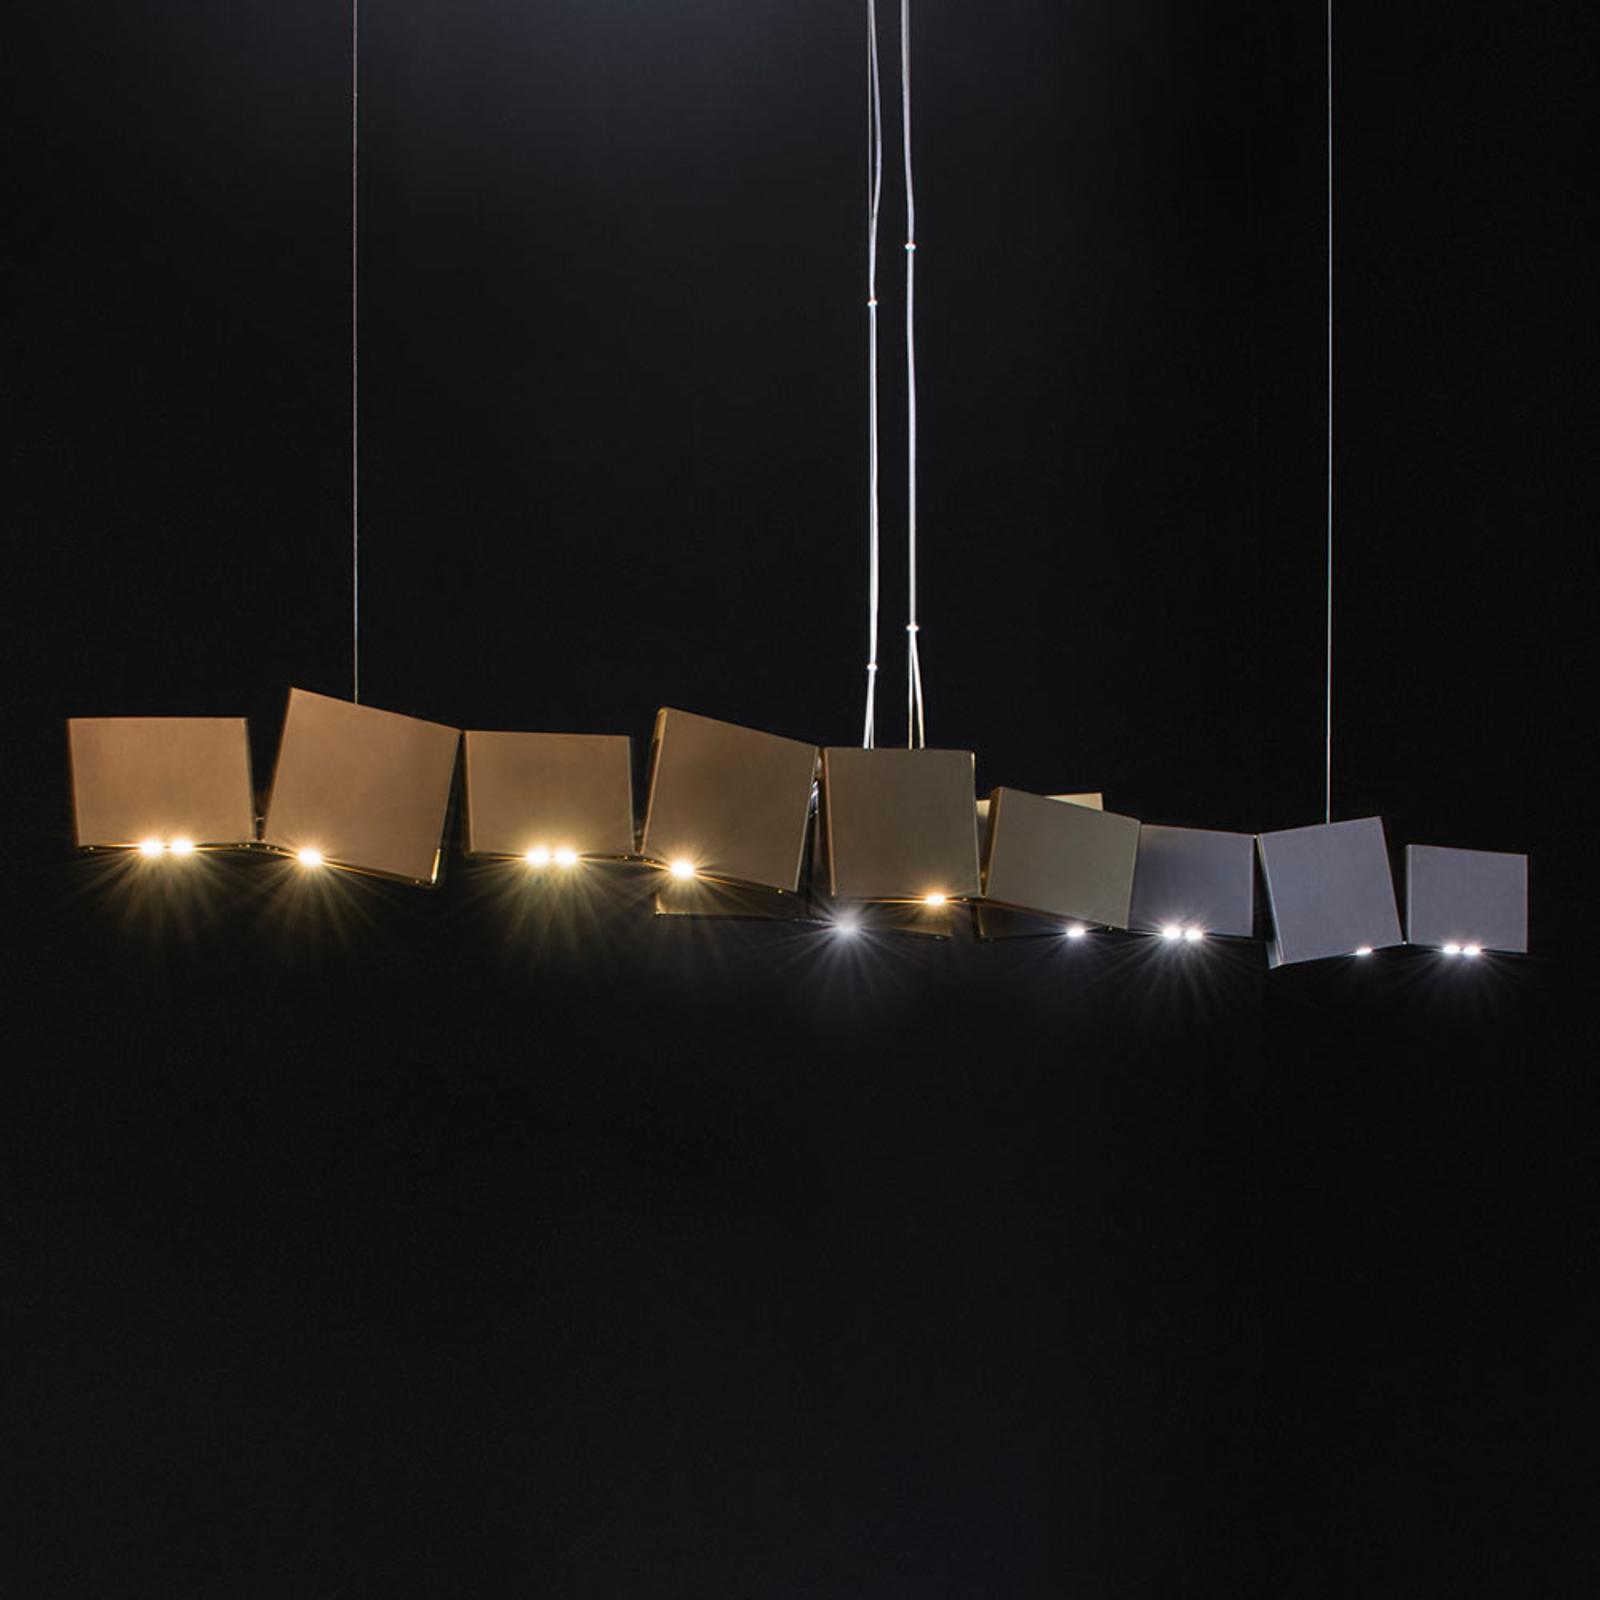 Terzani Gaia LED-hængelampe, 24 lyskilder